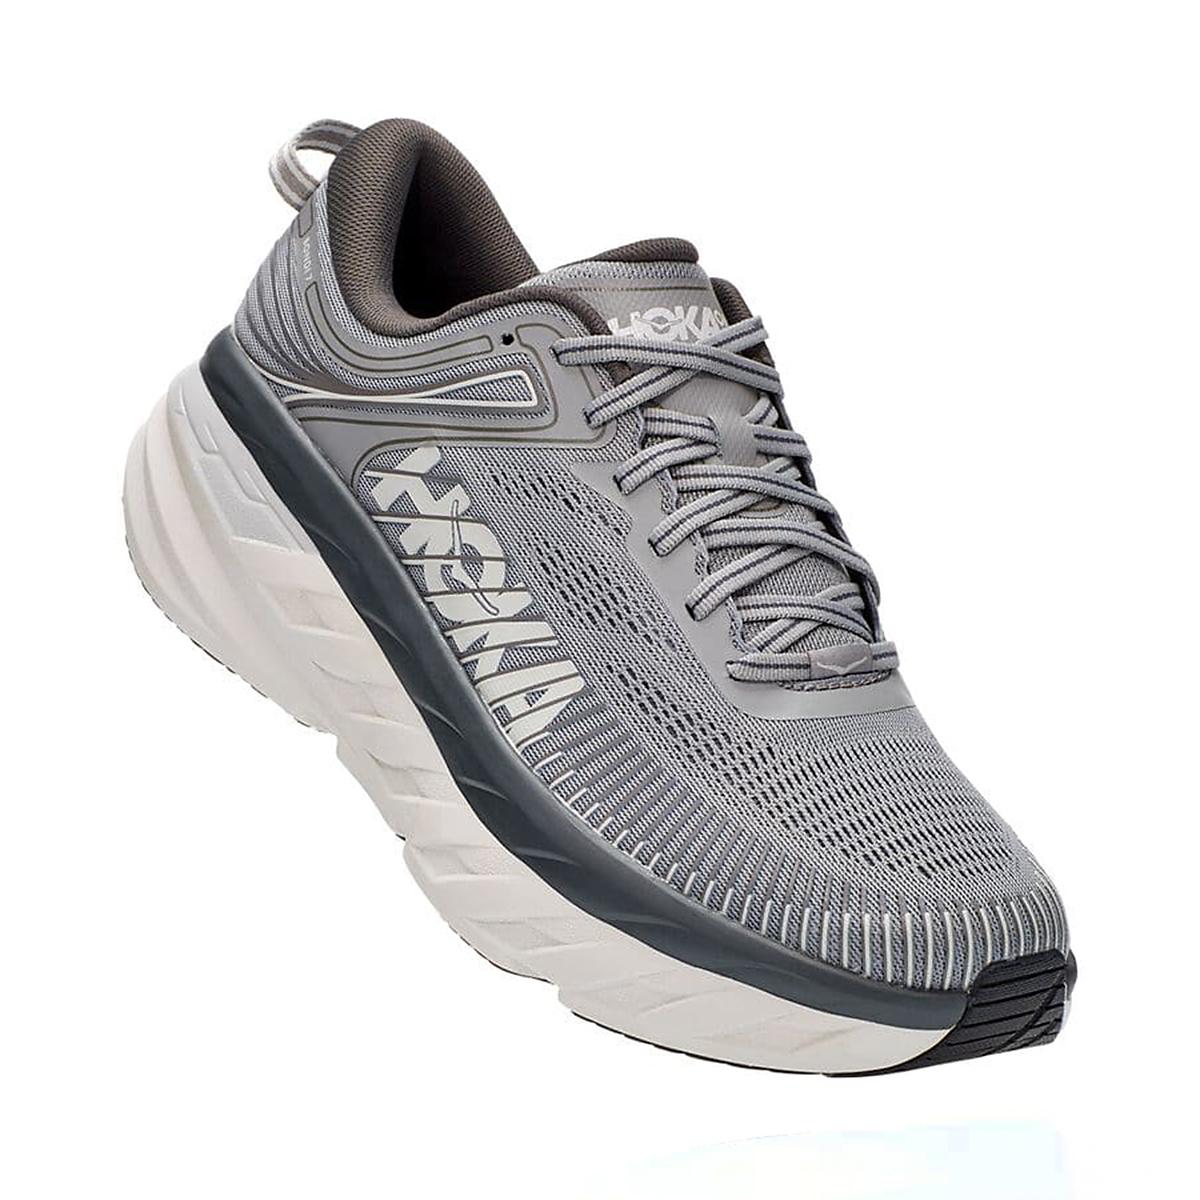 Men's Hoka One One Bondi 7 Running Shoe - Color: Wild Dove/Dark Shadow - Size: 7 - Width: Regular, Wild Dove/Dark Shadow, large, image 3